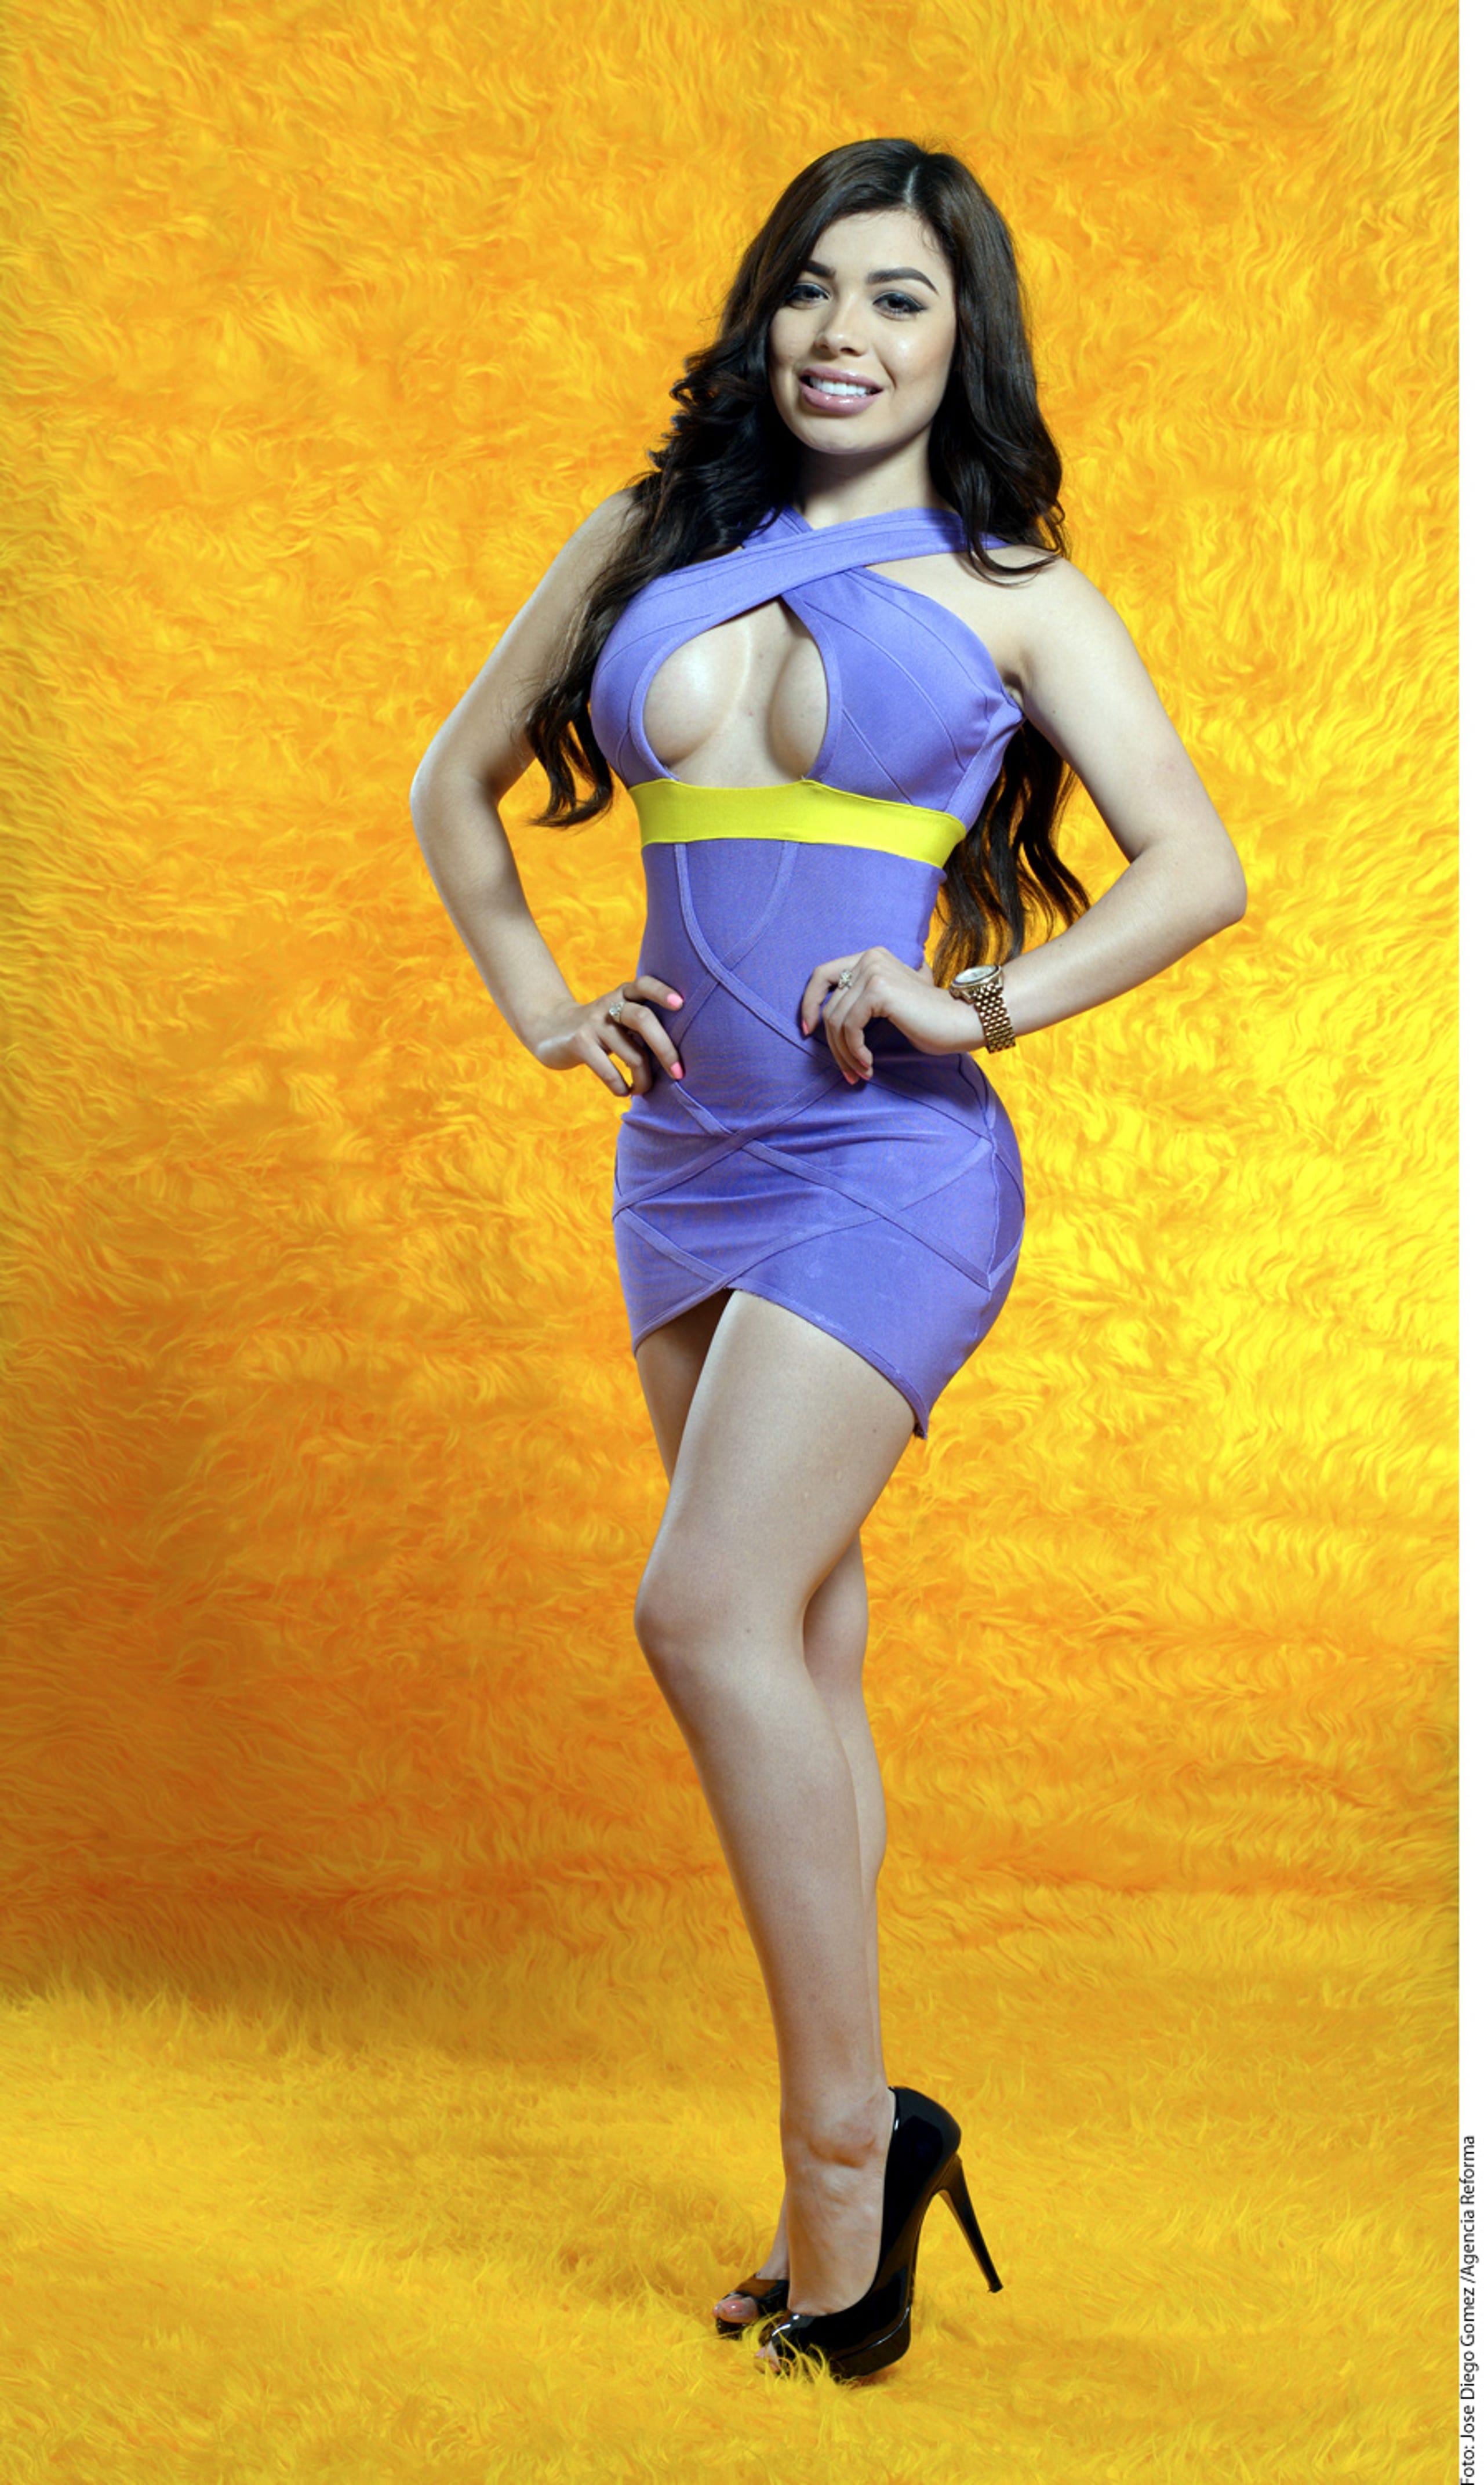 Saenz tracy Playboy Mexico